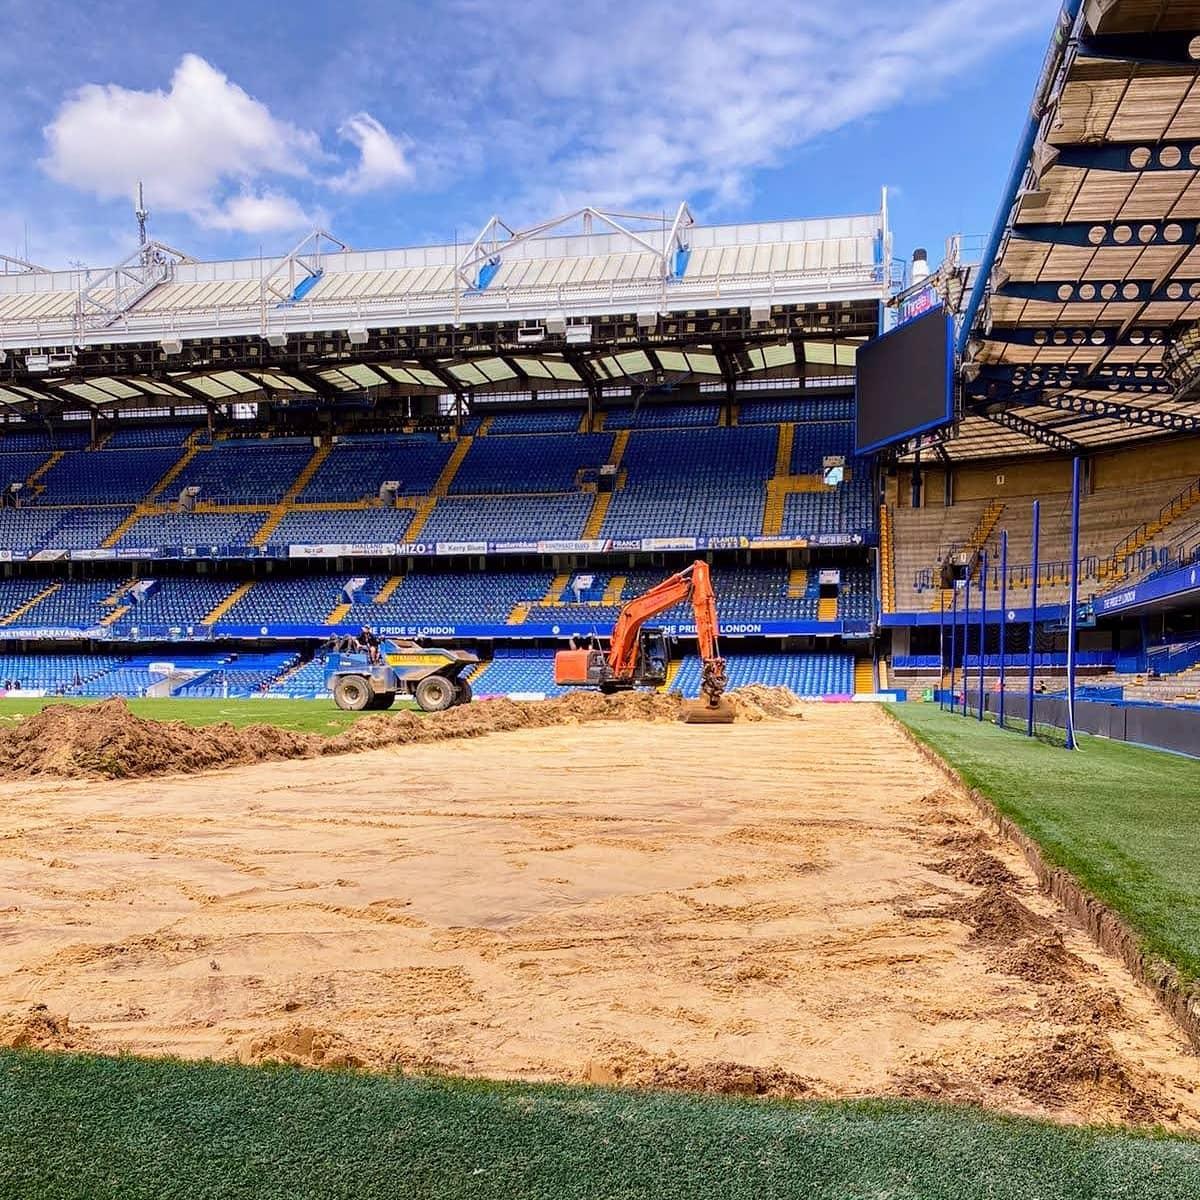 SISGRASS going in soon at Stamford Bridge! https://t.co/LvNFxb87Eb @ChelseaFC